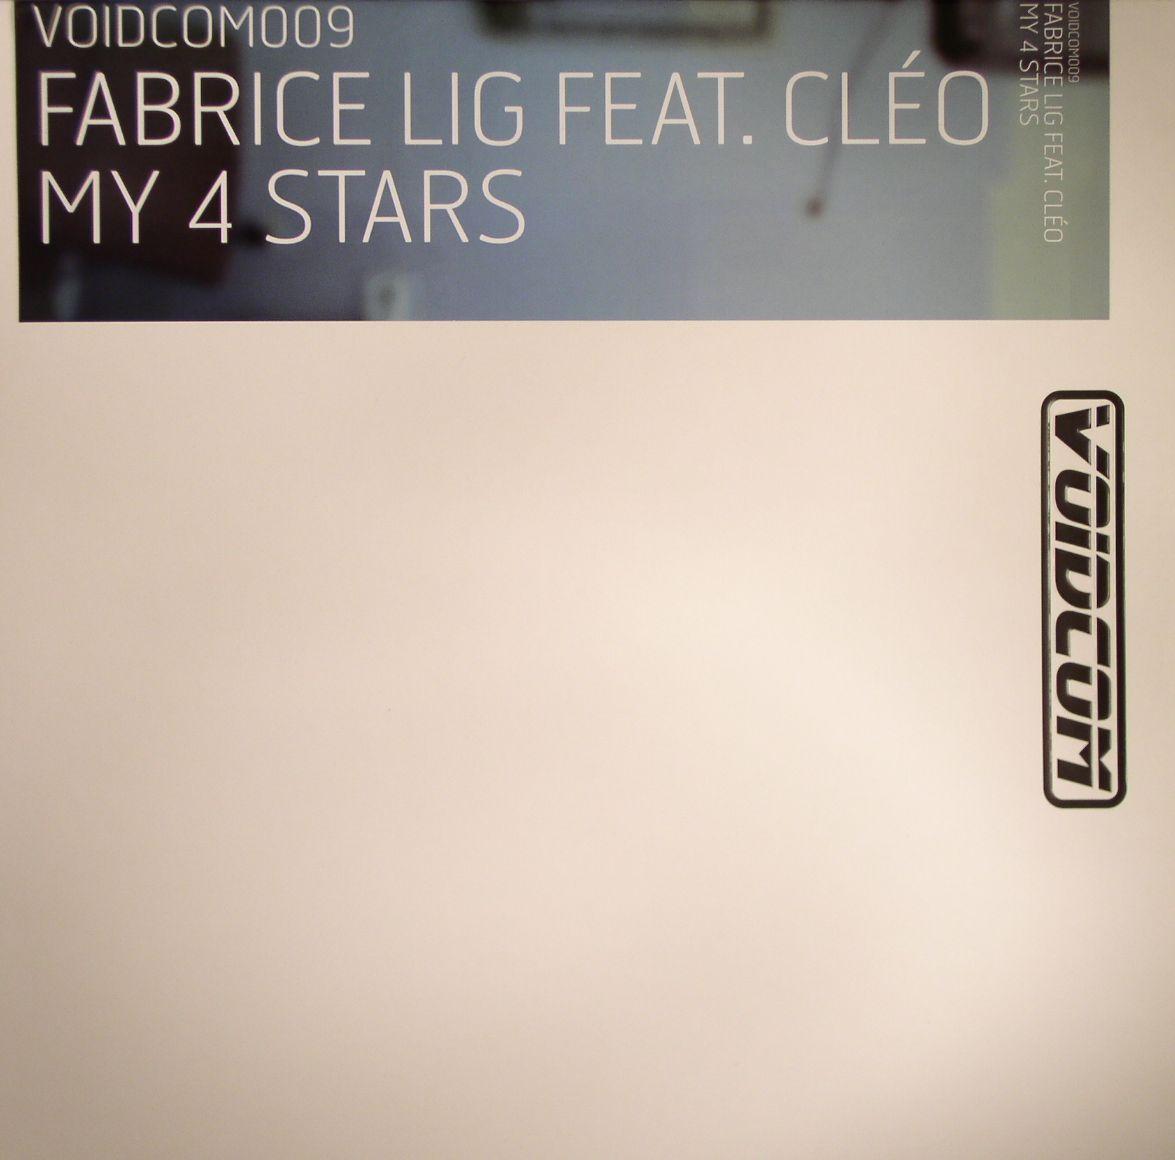 LIG, Fabrice feat CLEO - My 4 Stars